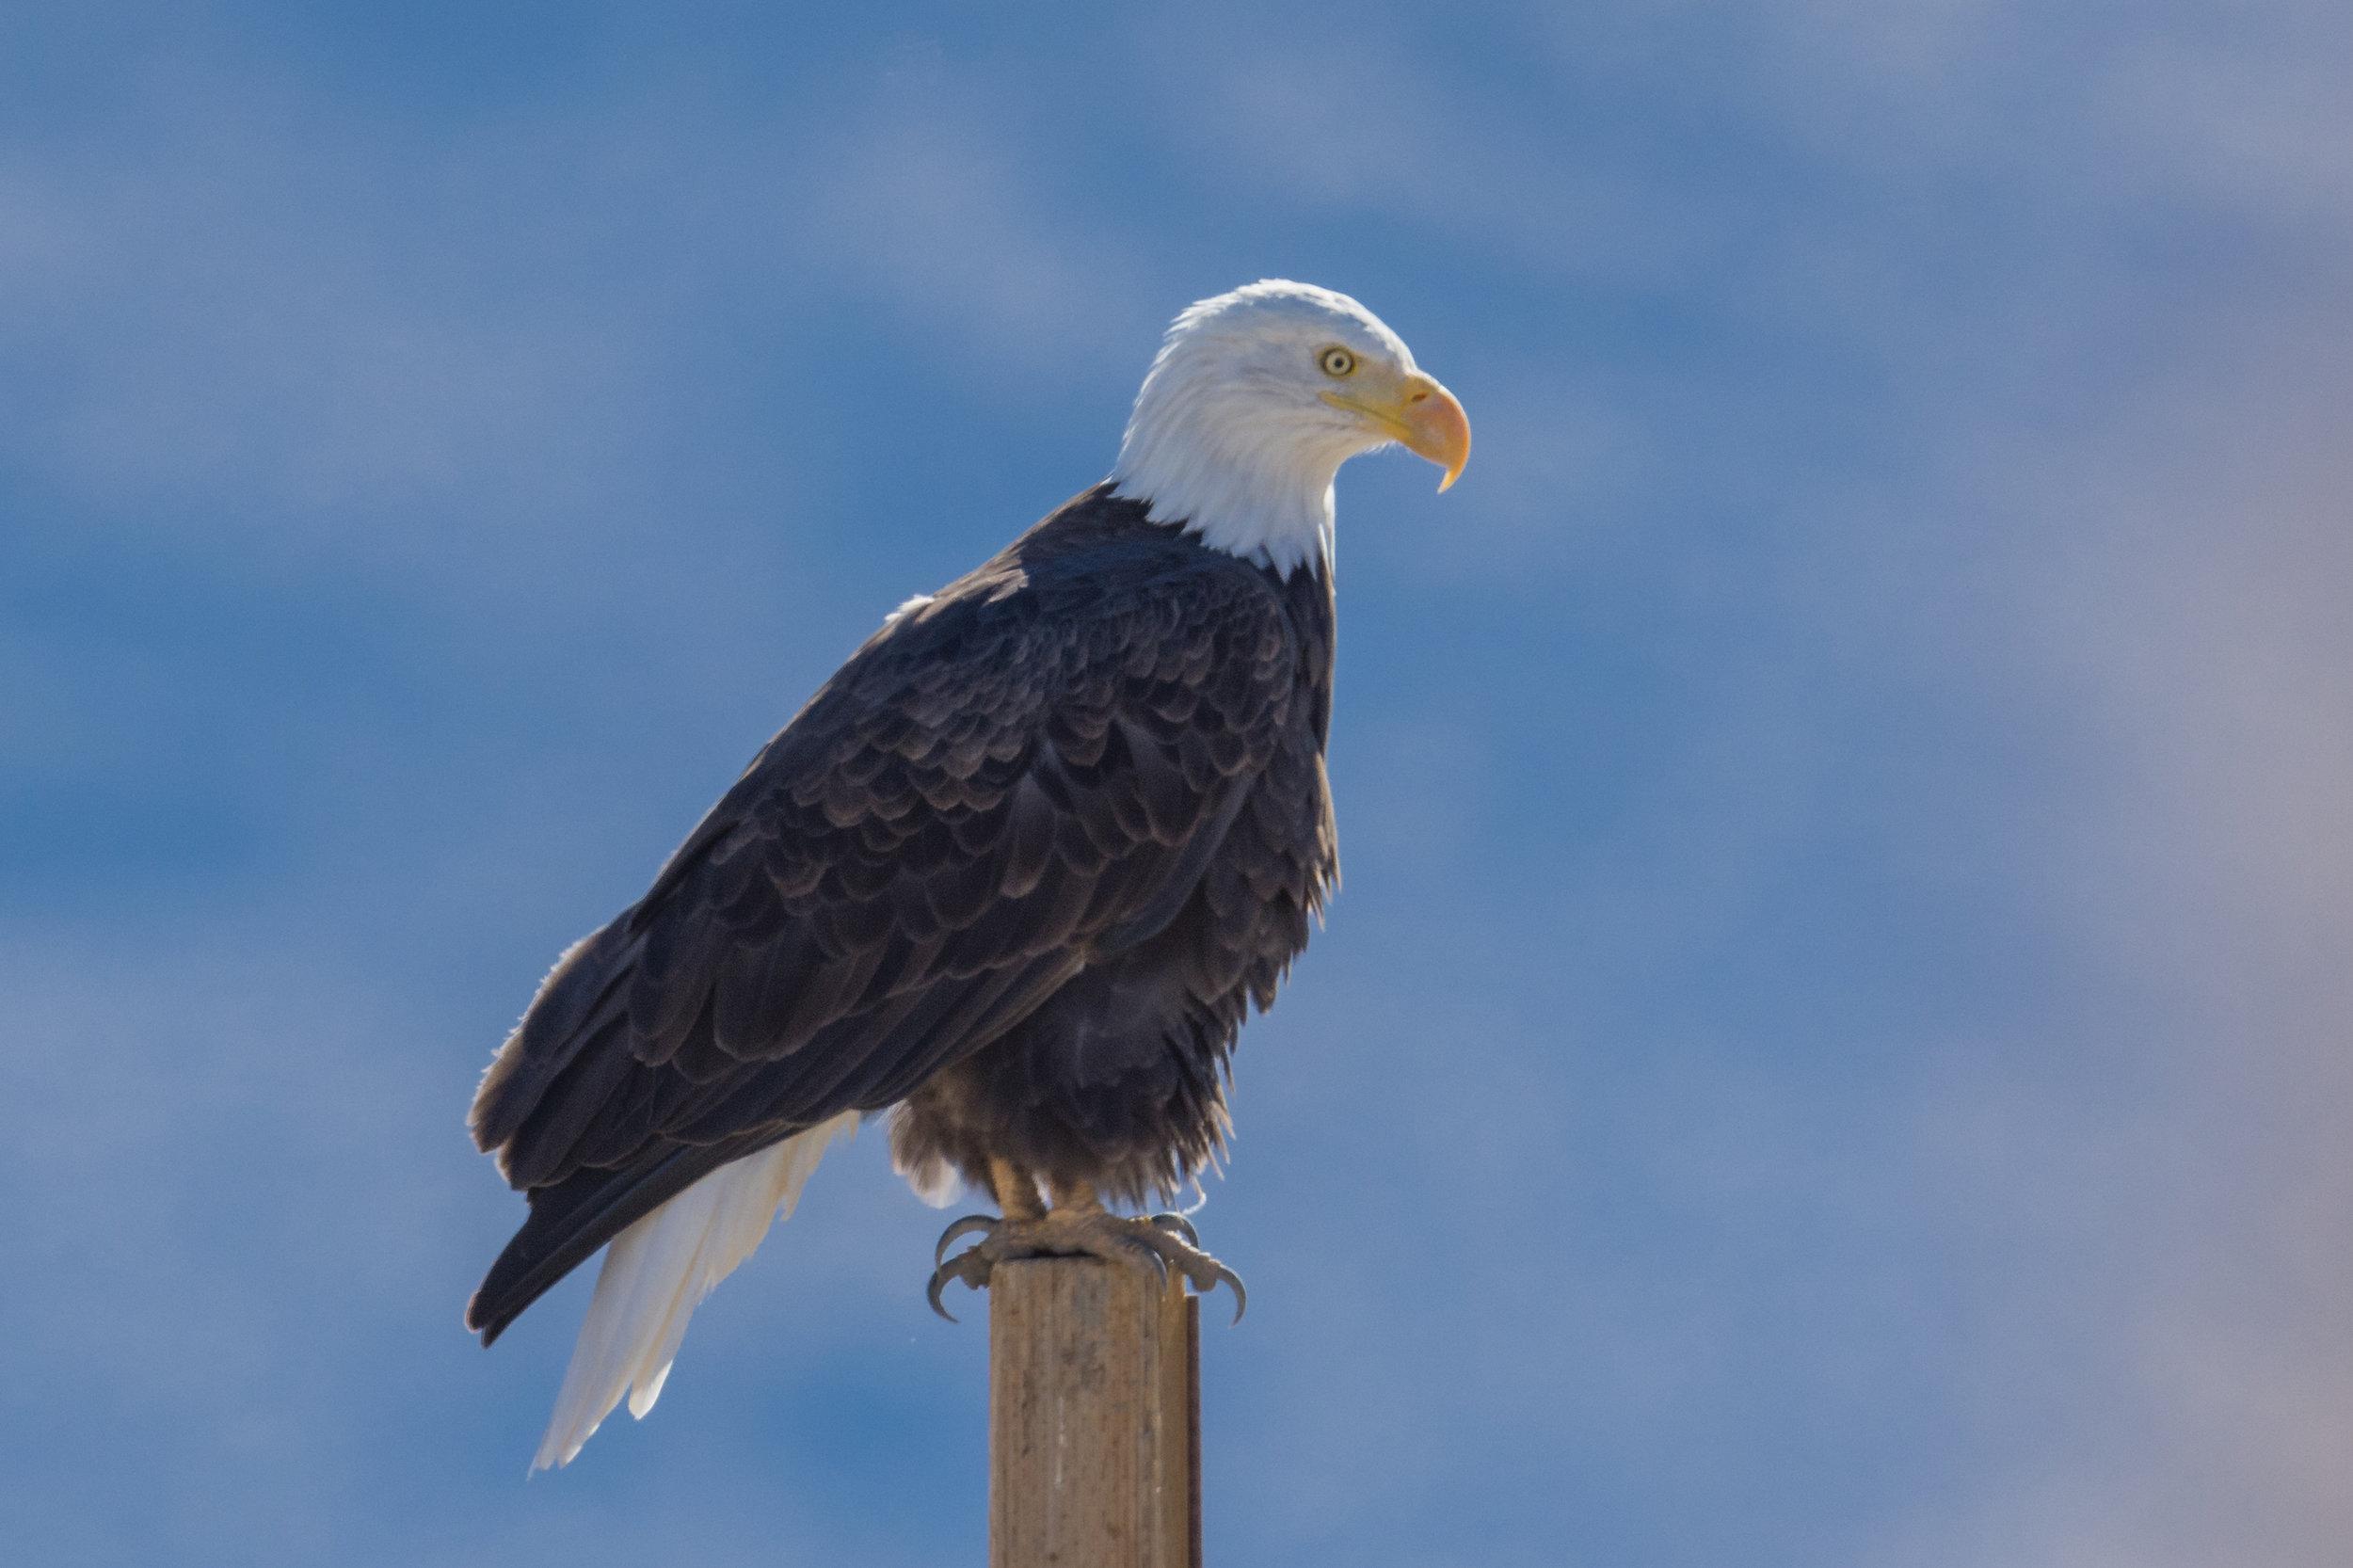 Washoe Lake SP, Taken: 11-9-2016 at 11:38, Sunny  EQ: D7200, 500mm f/4   Settings: 750 mm (eqiv), 1/1600s, f/5.6, ISO250, +1/3EV